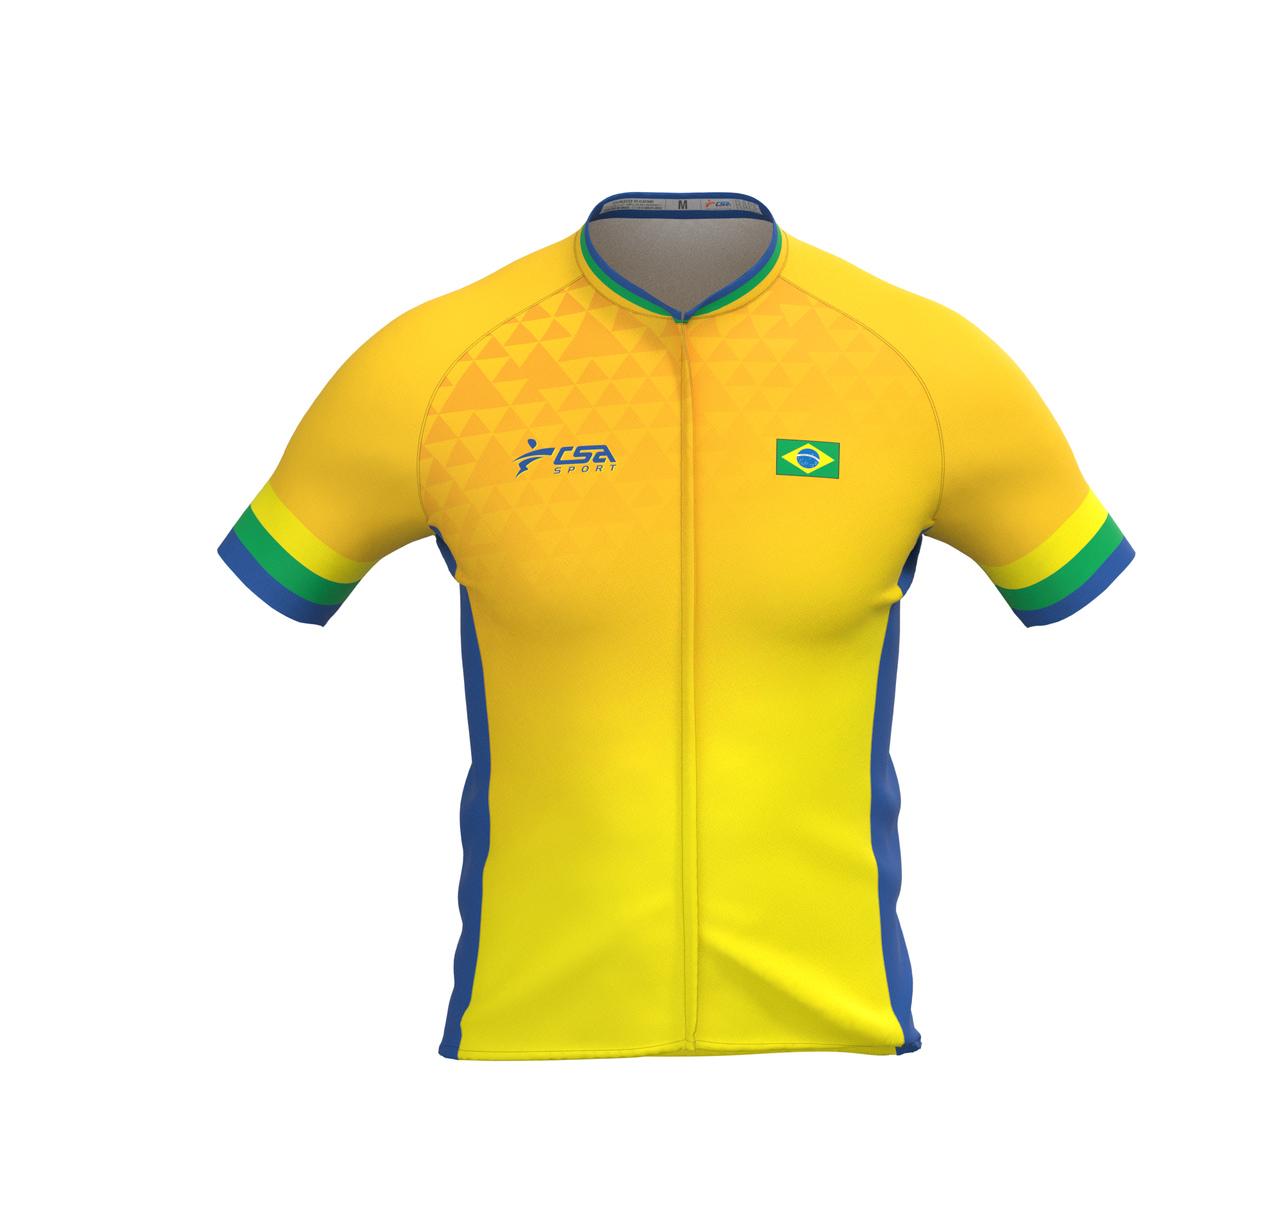 Camisa Ciclista Fast CSA Sport Feminina Brasil Gold